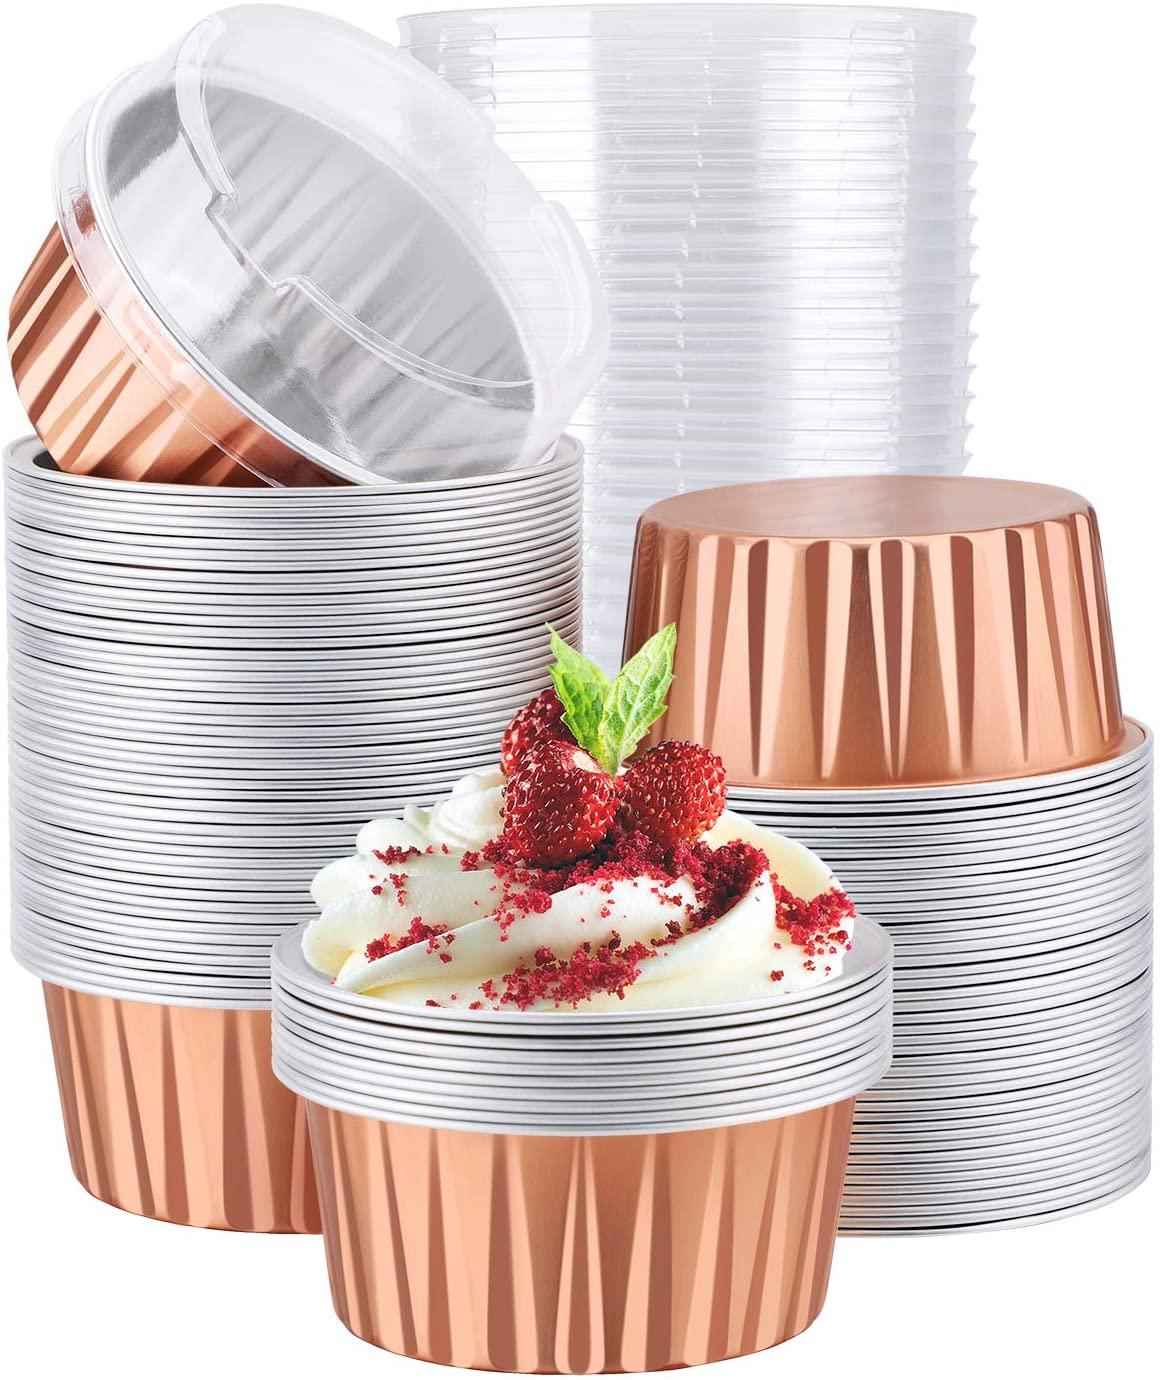 100pcsCupcake Liners, Eusoar 5oz 125ml Muffin Liners Cups with Lids, Creme Brulee Ramekins, Disposable Foil Ramekins, Aluminum Foil Baking Cups, Cupcake Baking Cups, Aluminum Foil Cupcake Holder Pan